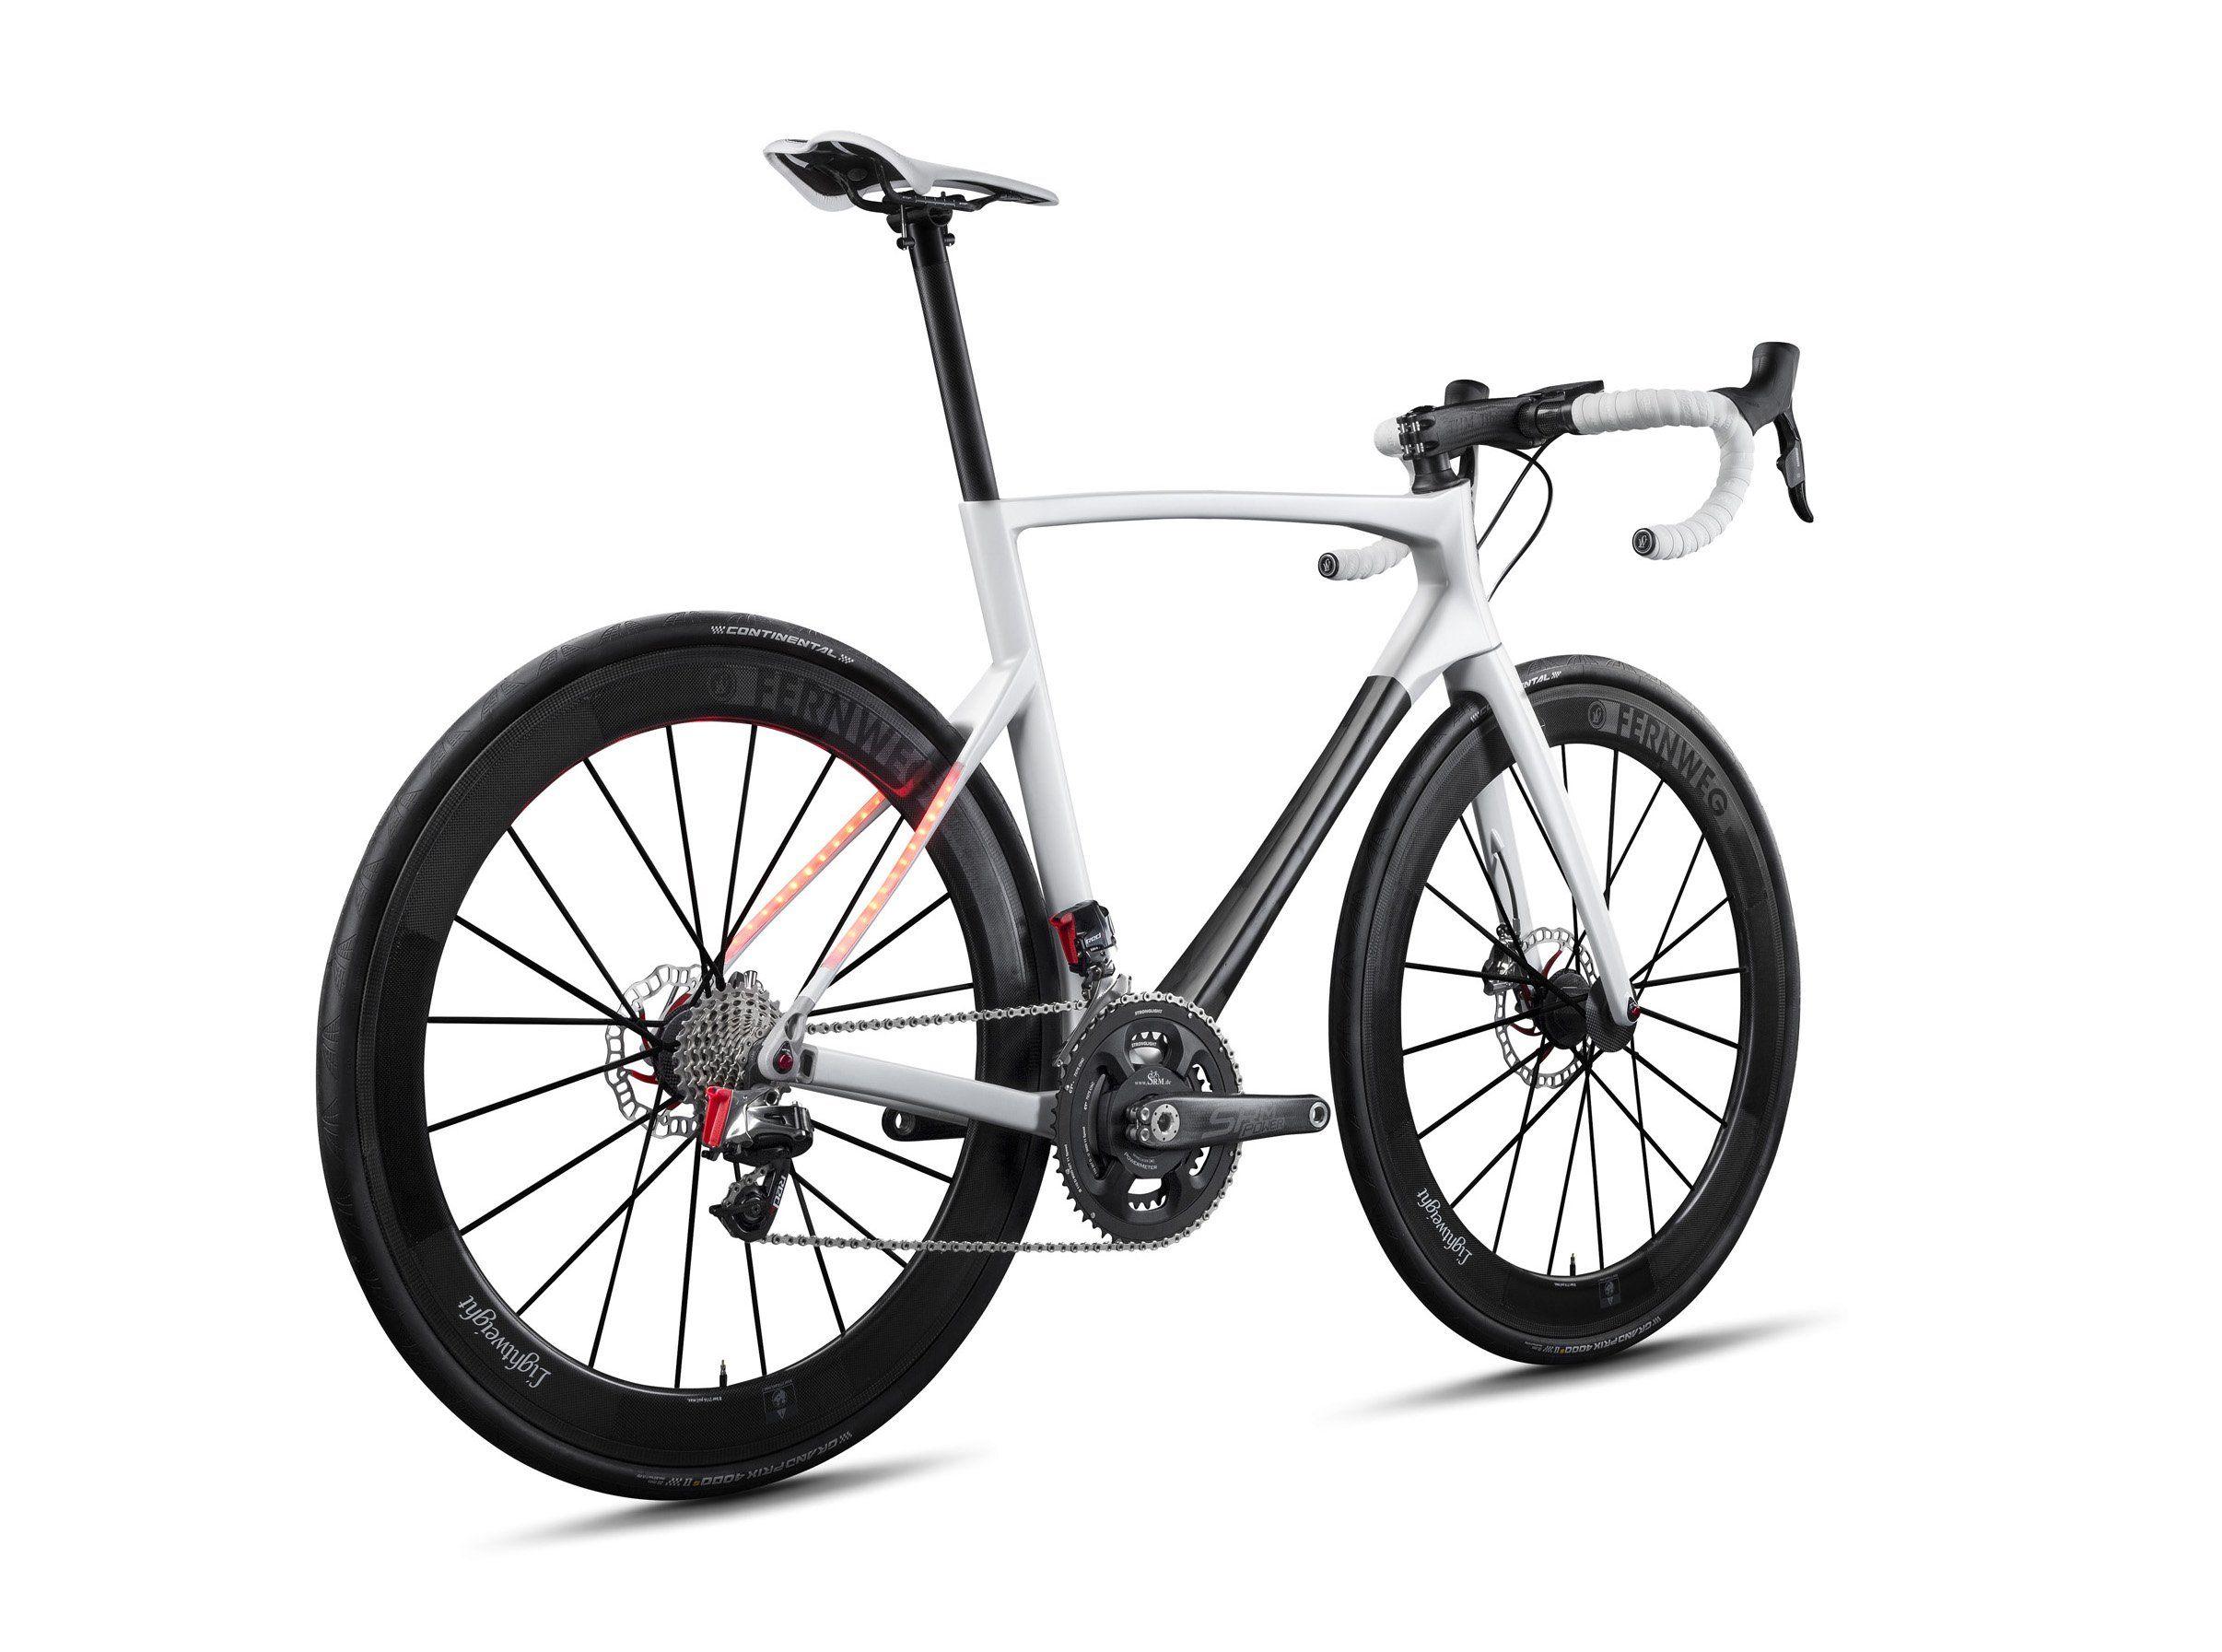 Lightweight Launches New Ride And Urgestalt Disc Frames Lightweight Riding Road Bikes